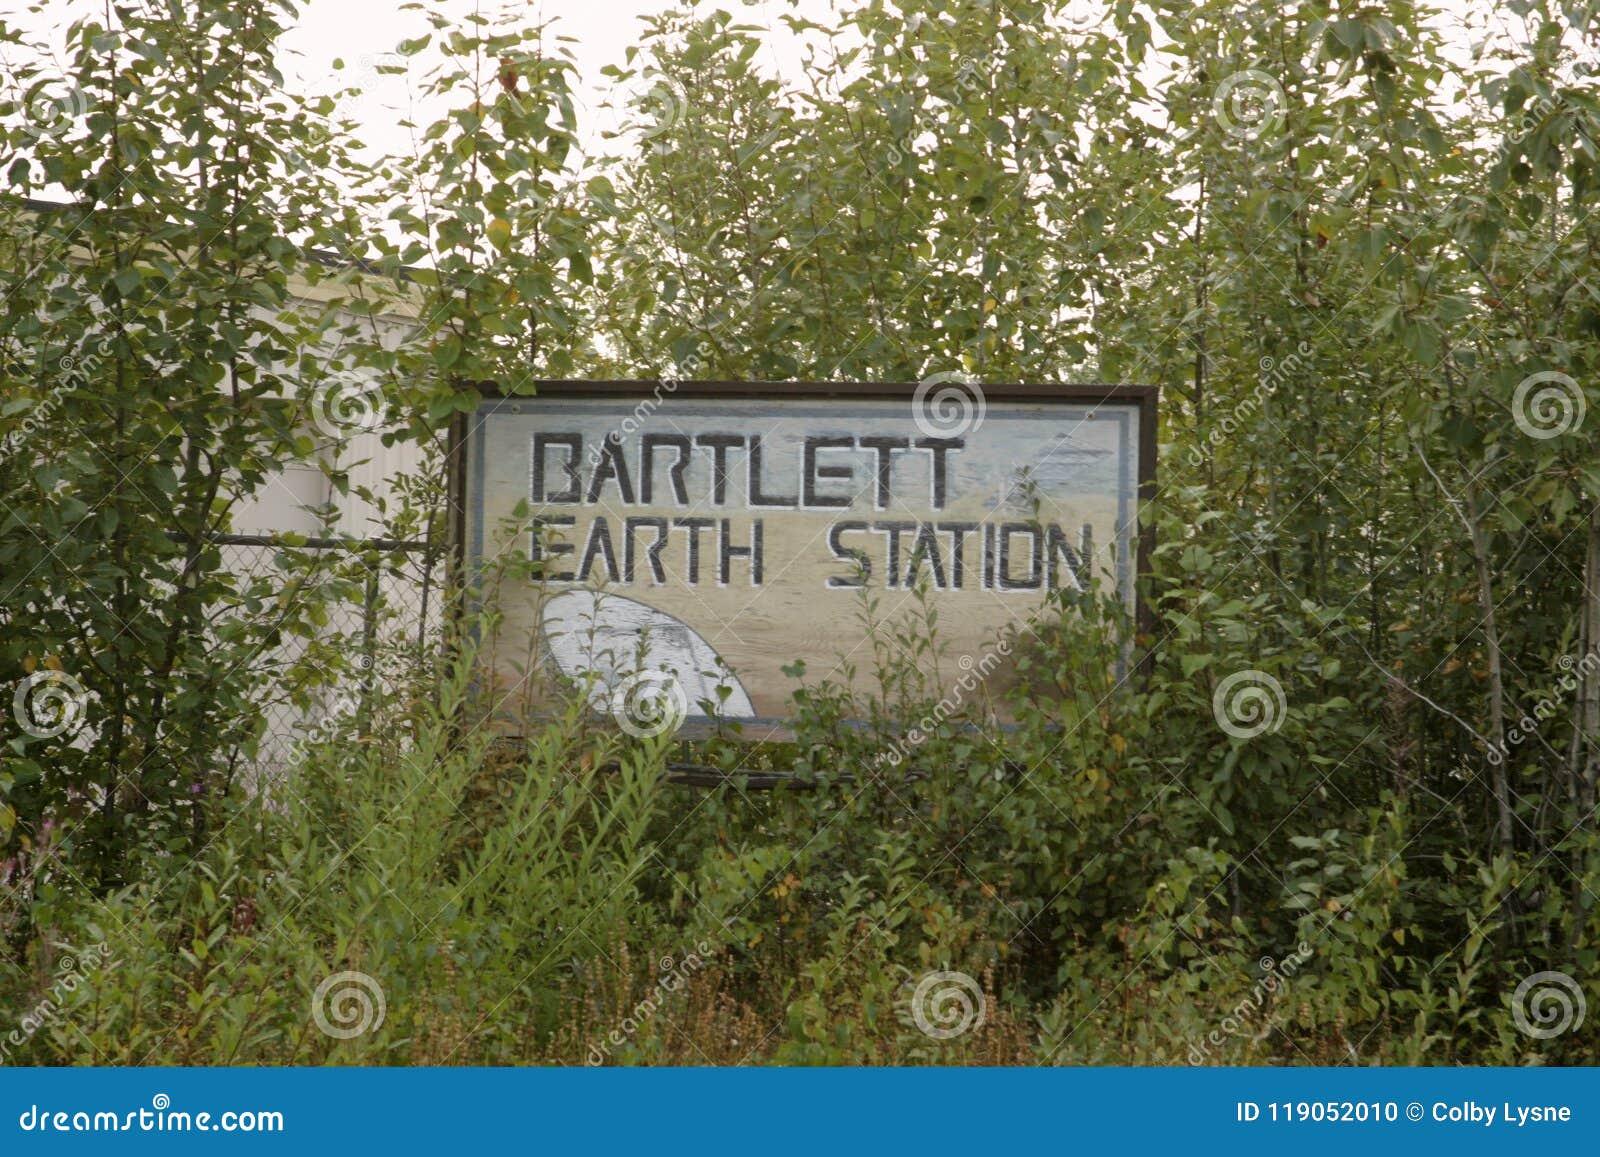 Signe envahi pour Bartlett Earth Station